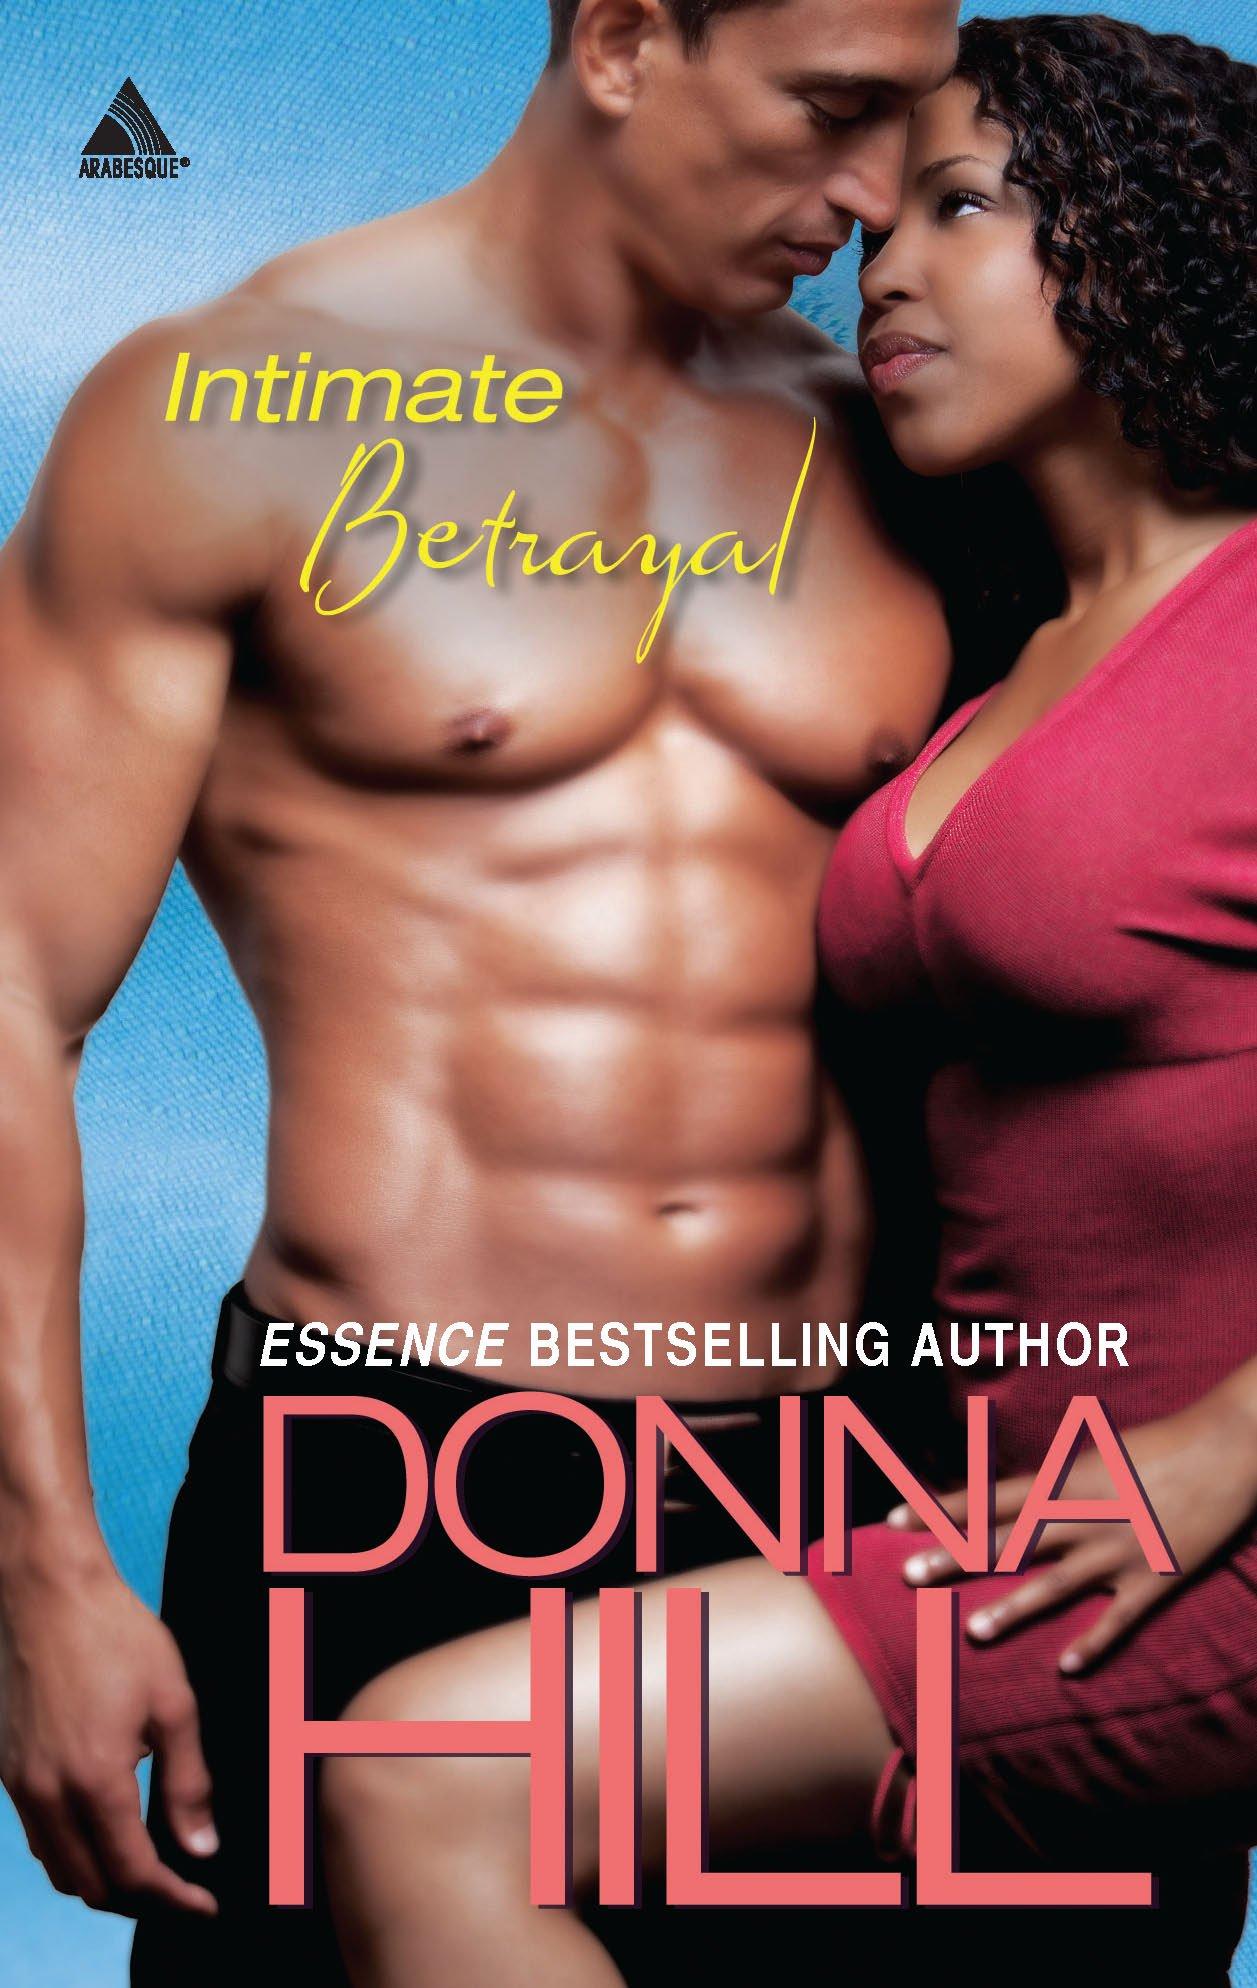 Intimate Betrayal (Arabesque) PDF